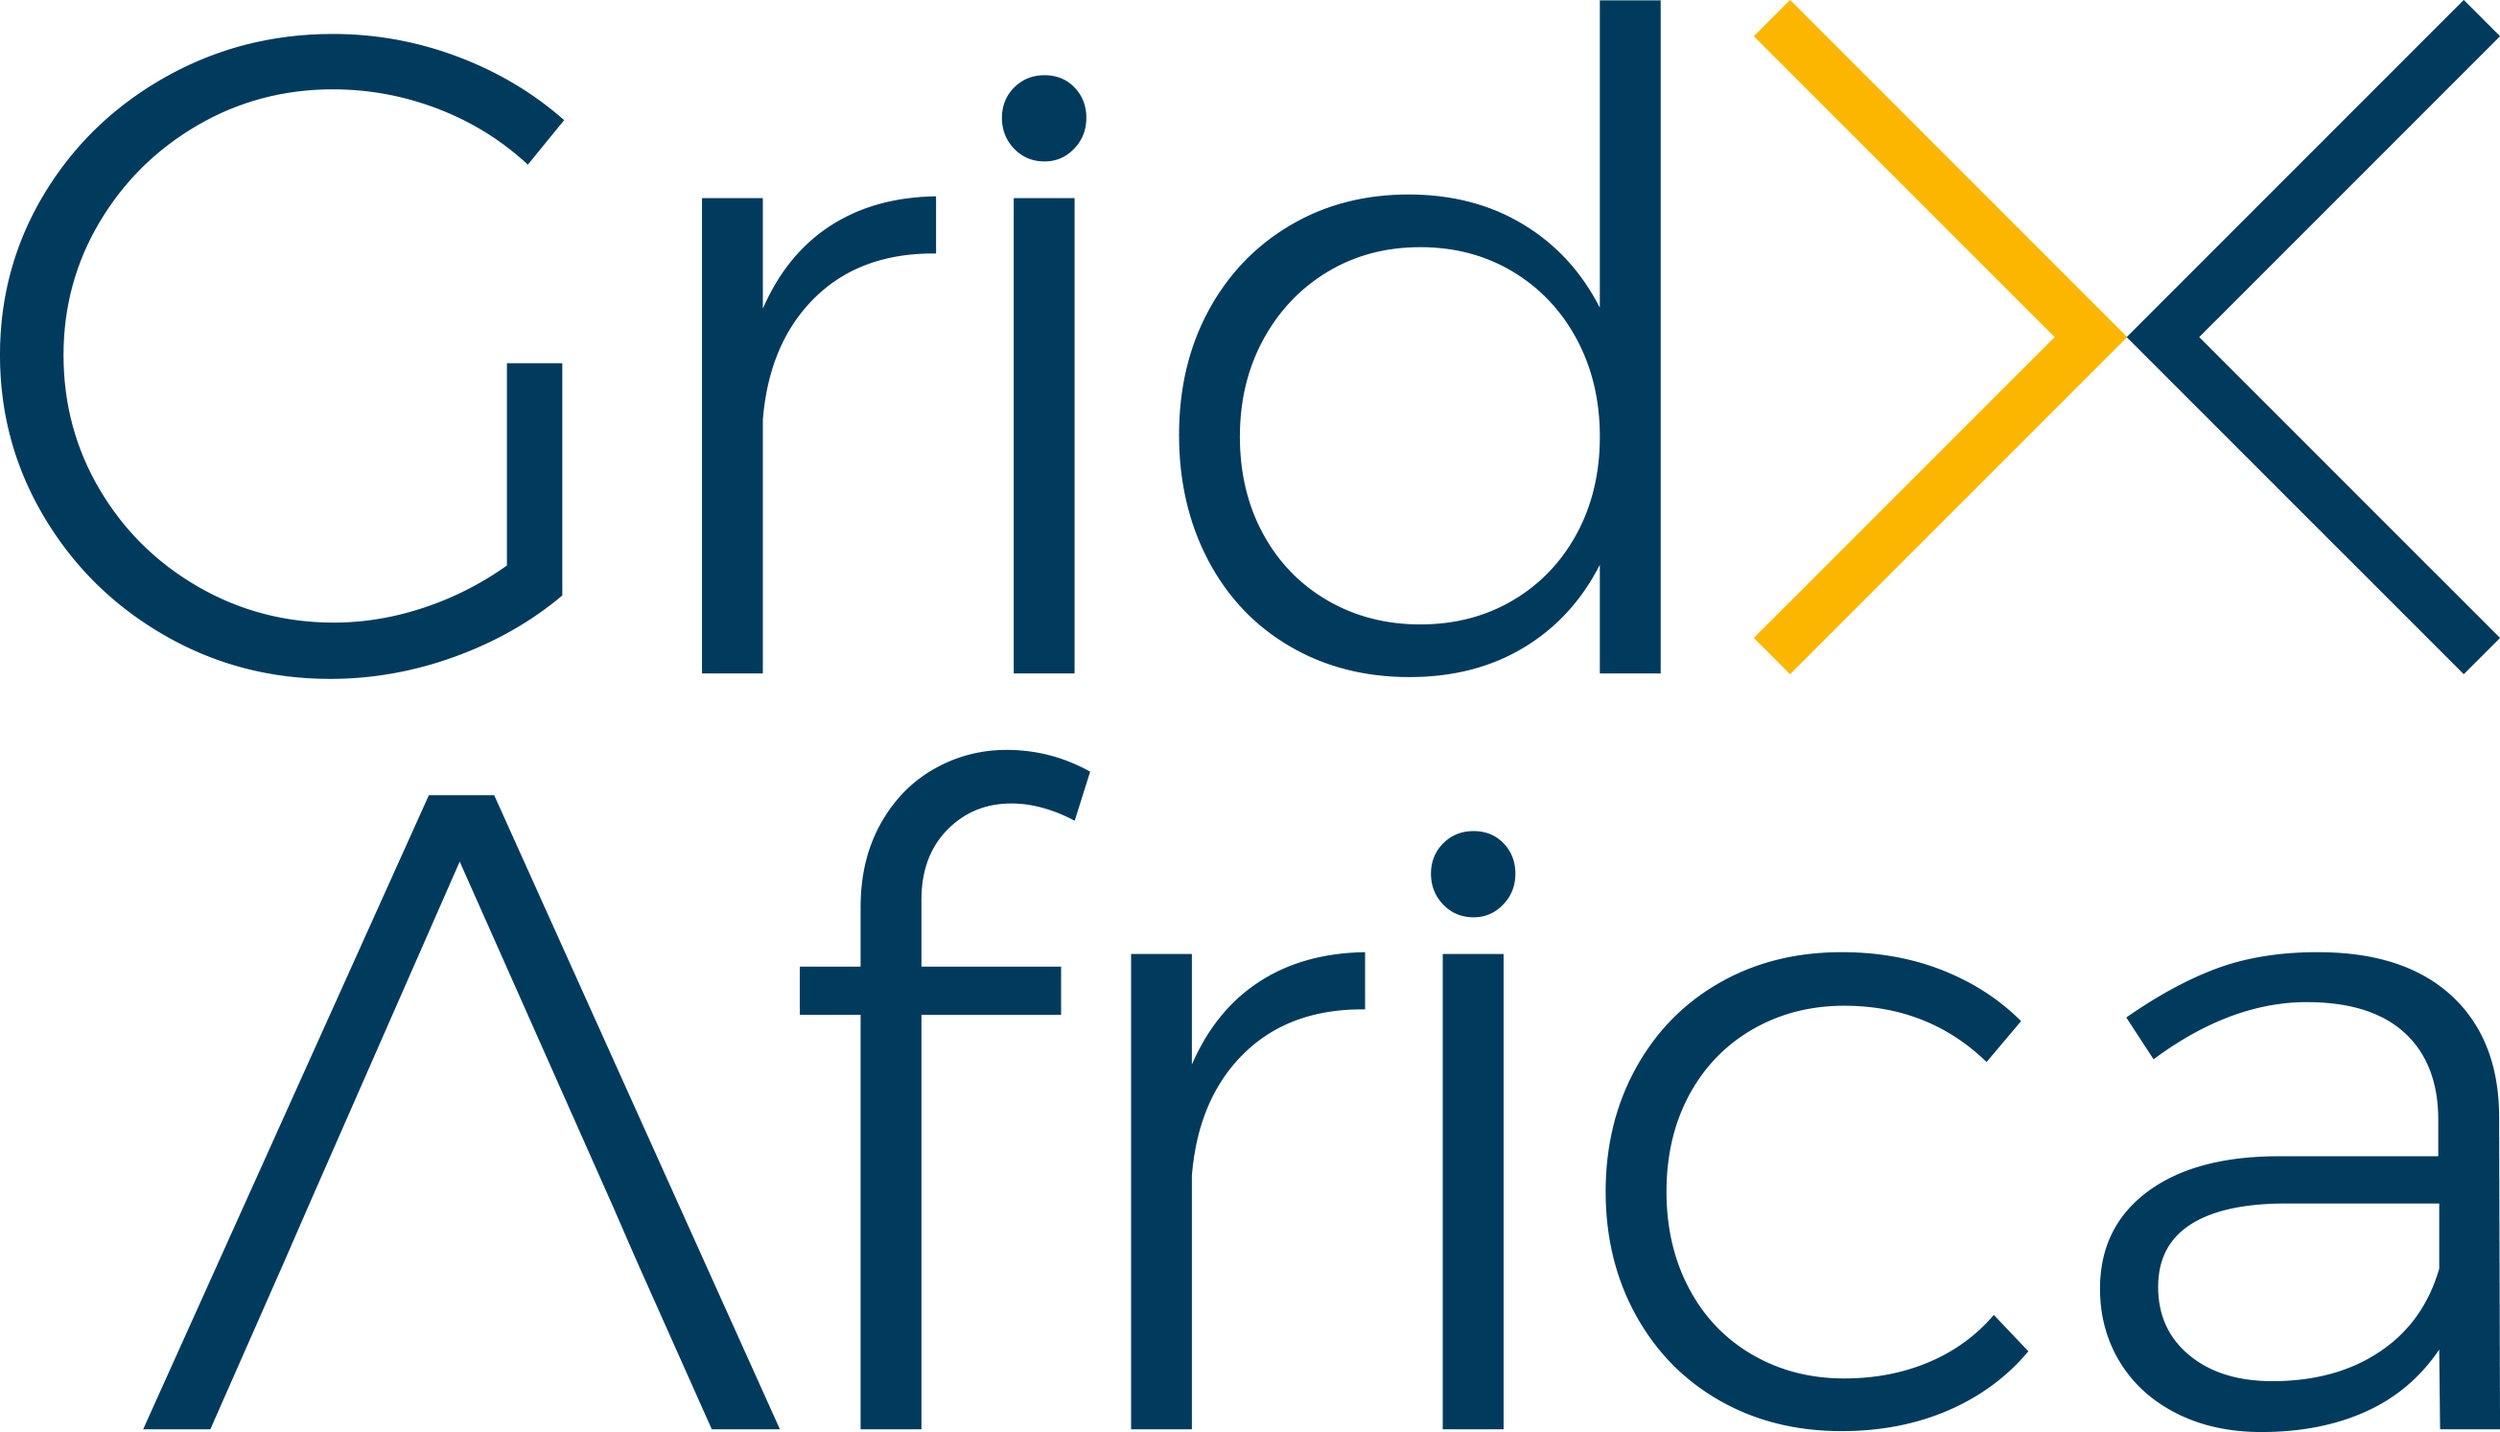 GRIDX_AFRICA_LOGO_BLUE_YELLOW.jpg